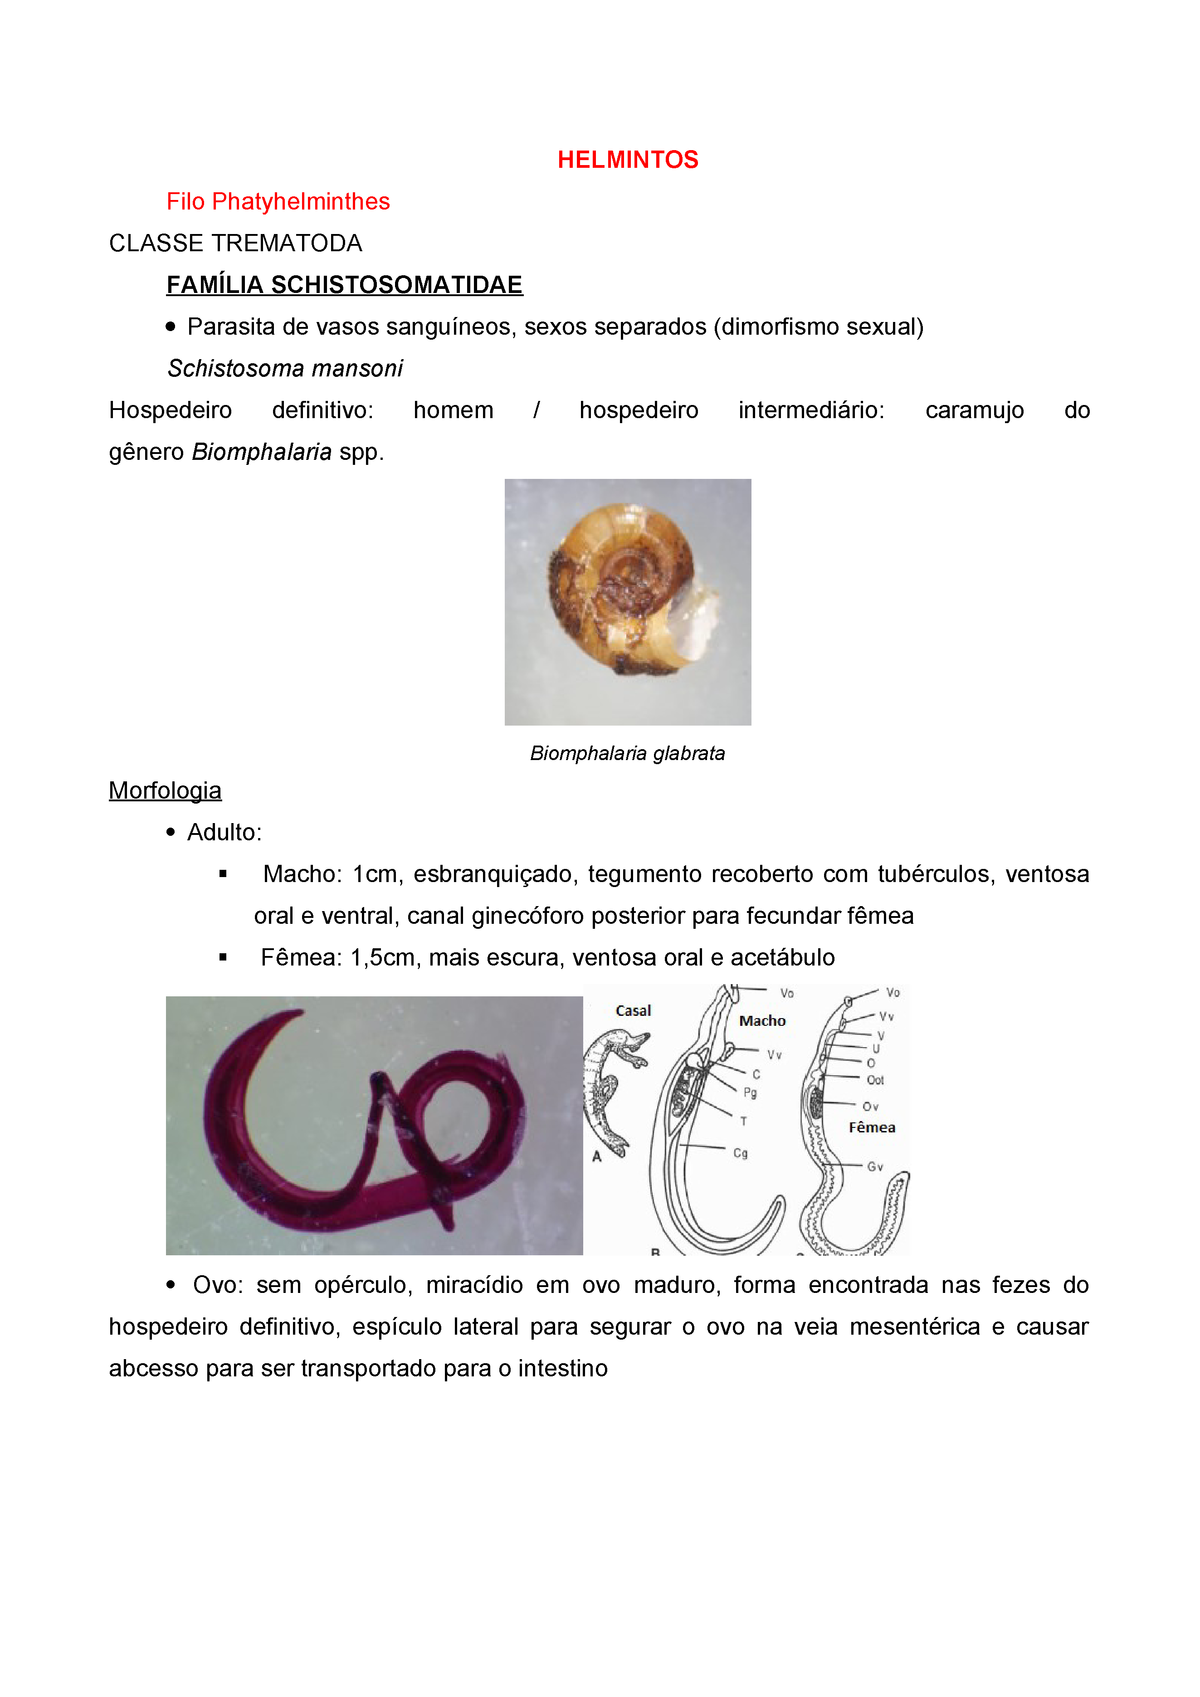 enterobius vermicularis hospedeiro definitivo)